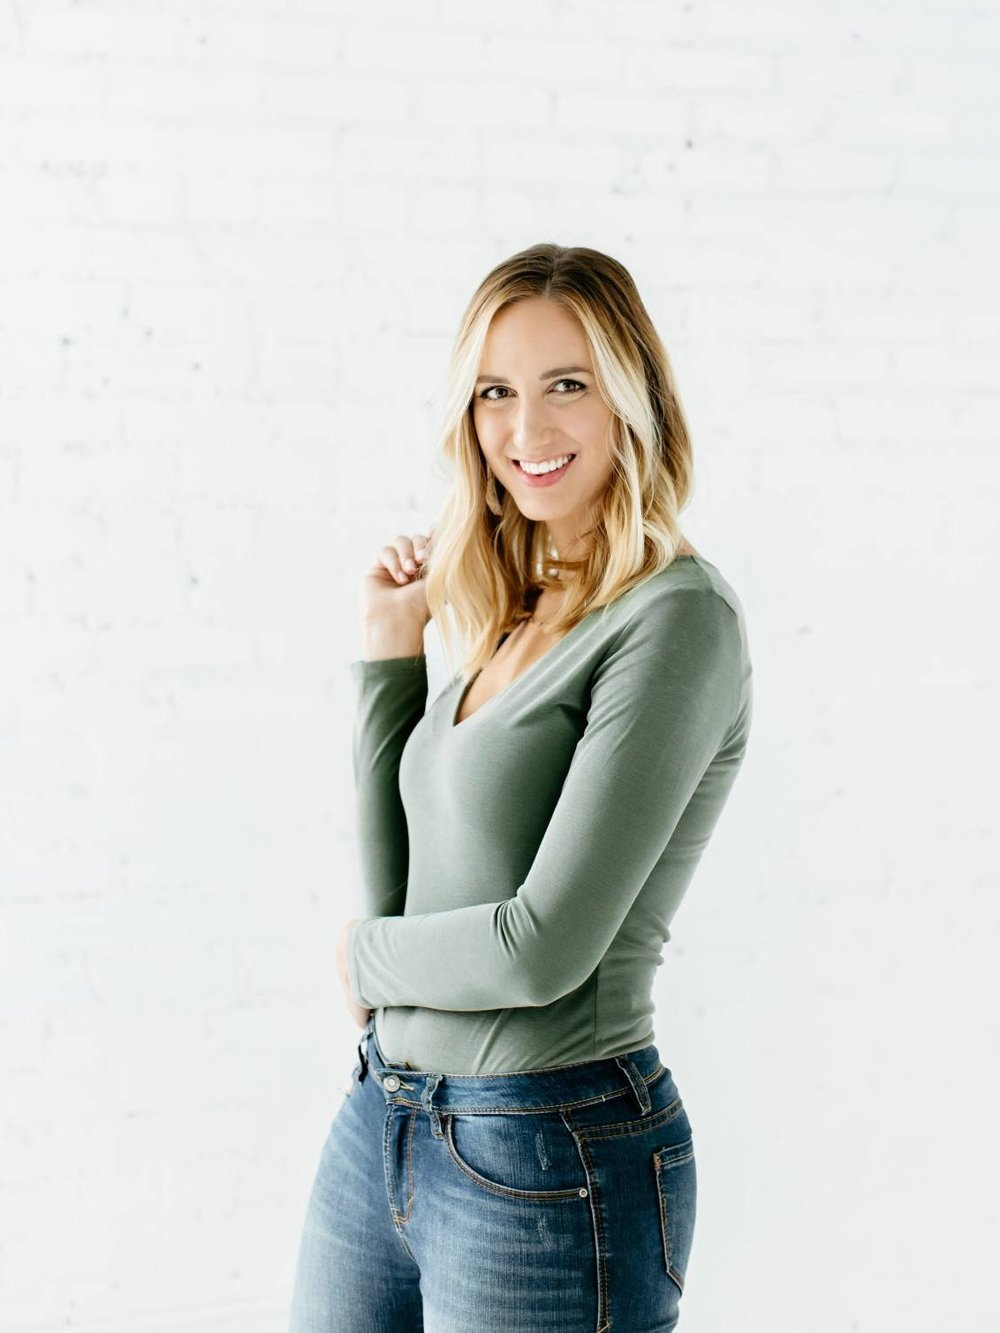 Alexa-Vossler-Photo_Dallas-Headshot-Photographer_Headshots-at-The-Lumen-Room_Kaitlyn-19.jpg